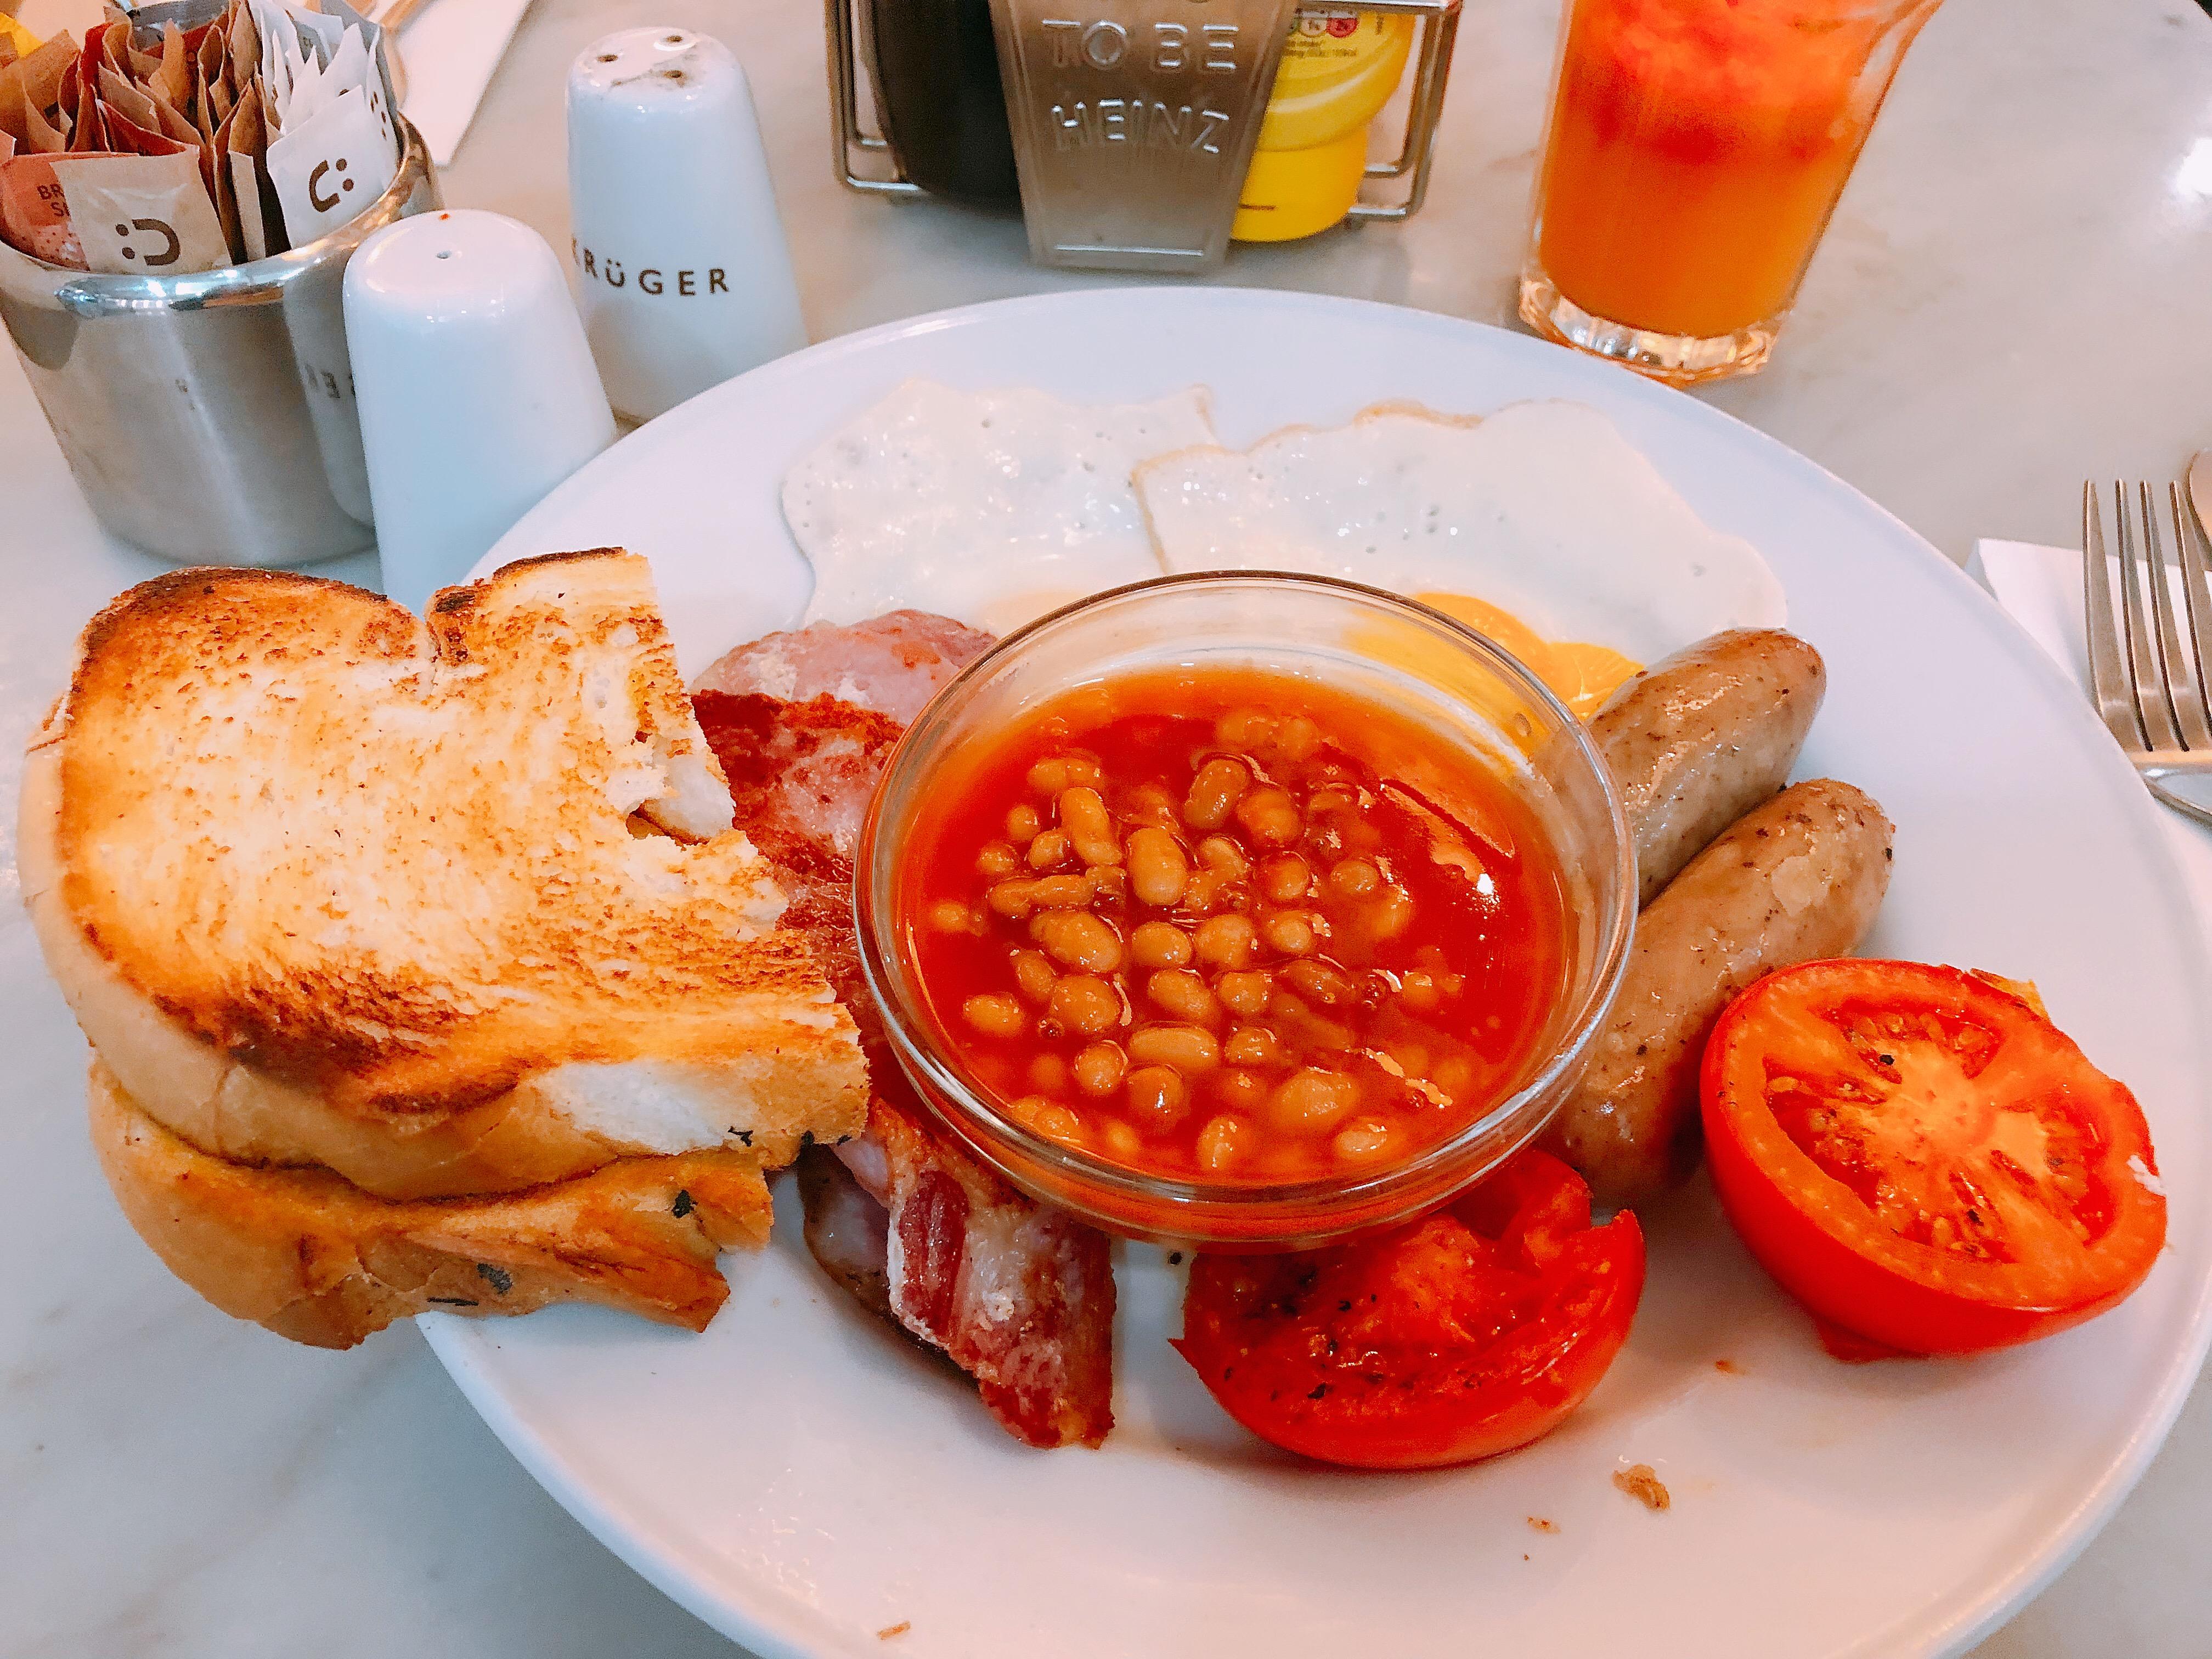 Krüger Full English breakfast